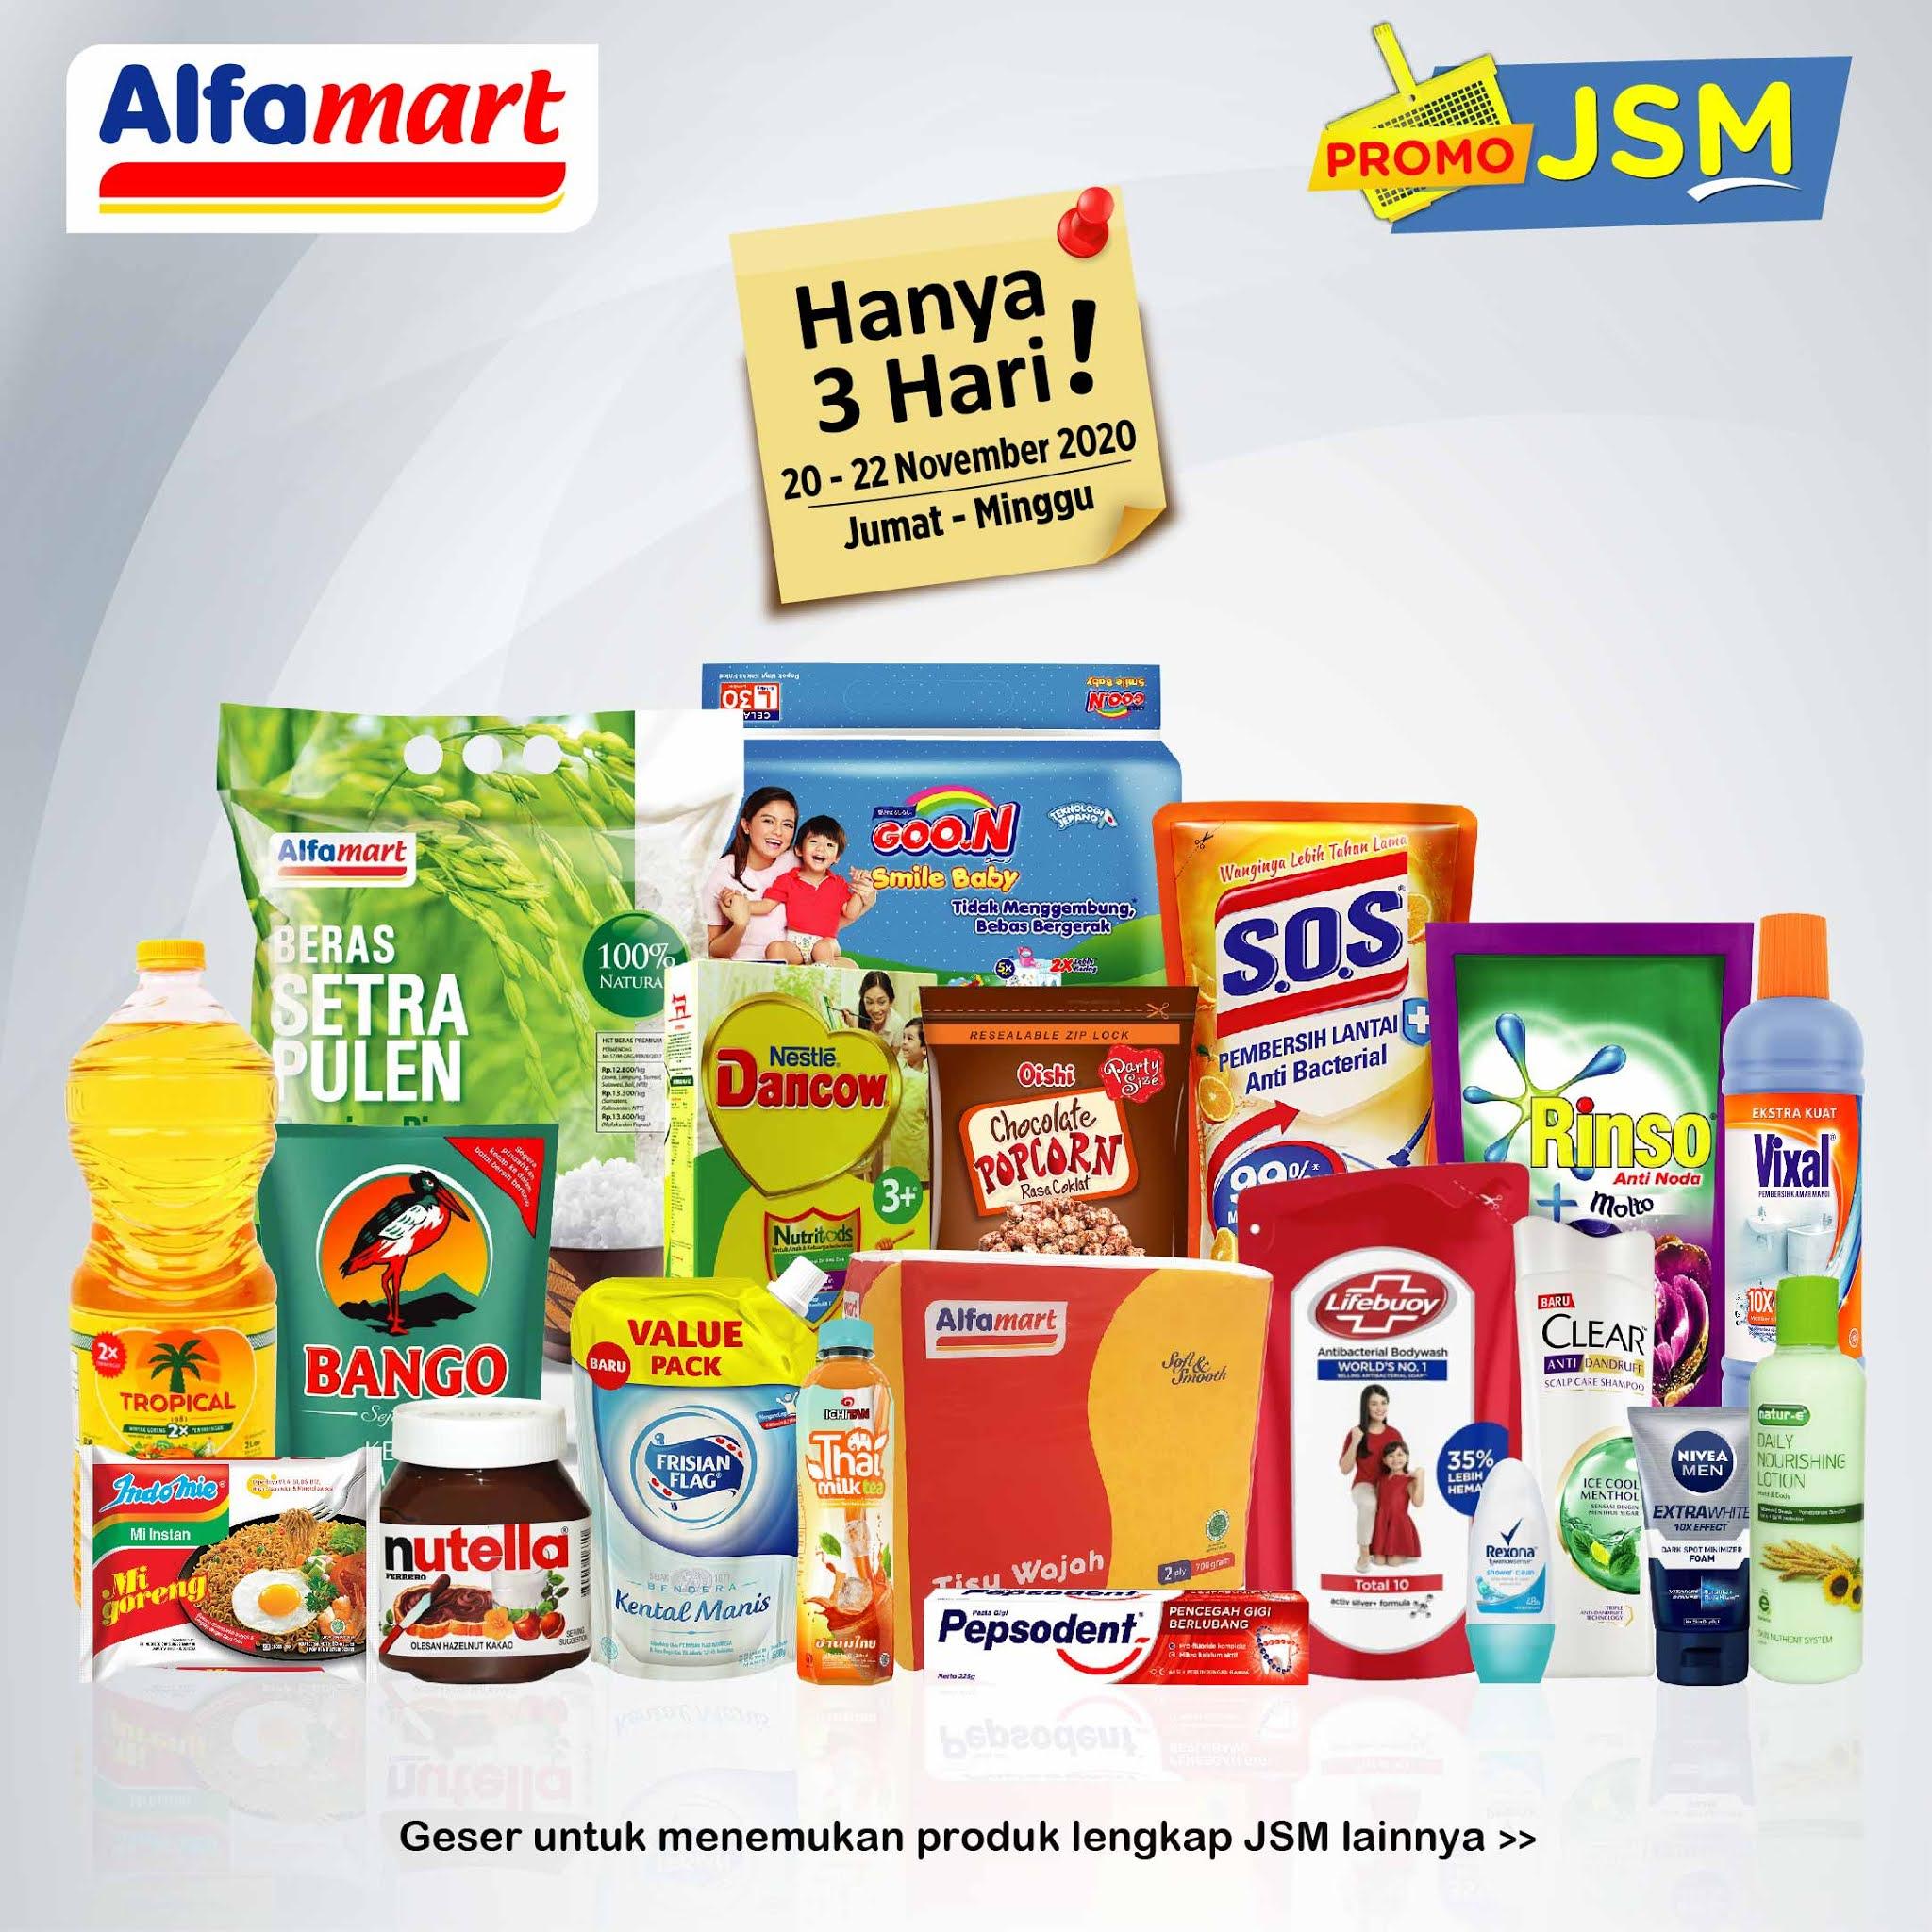 Promo Alfamart Jsm Akhir Pekan 20 22 November 2020 Harga Diskon